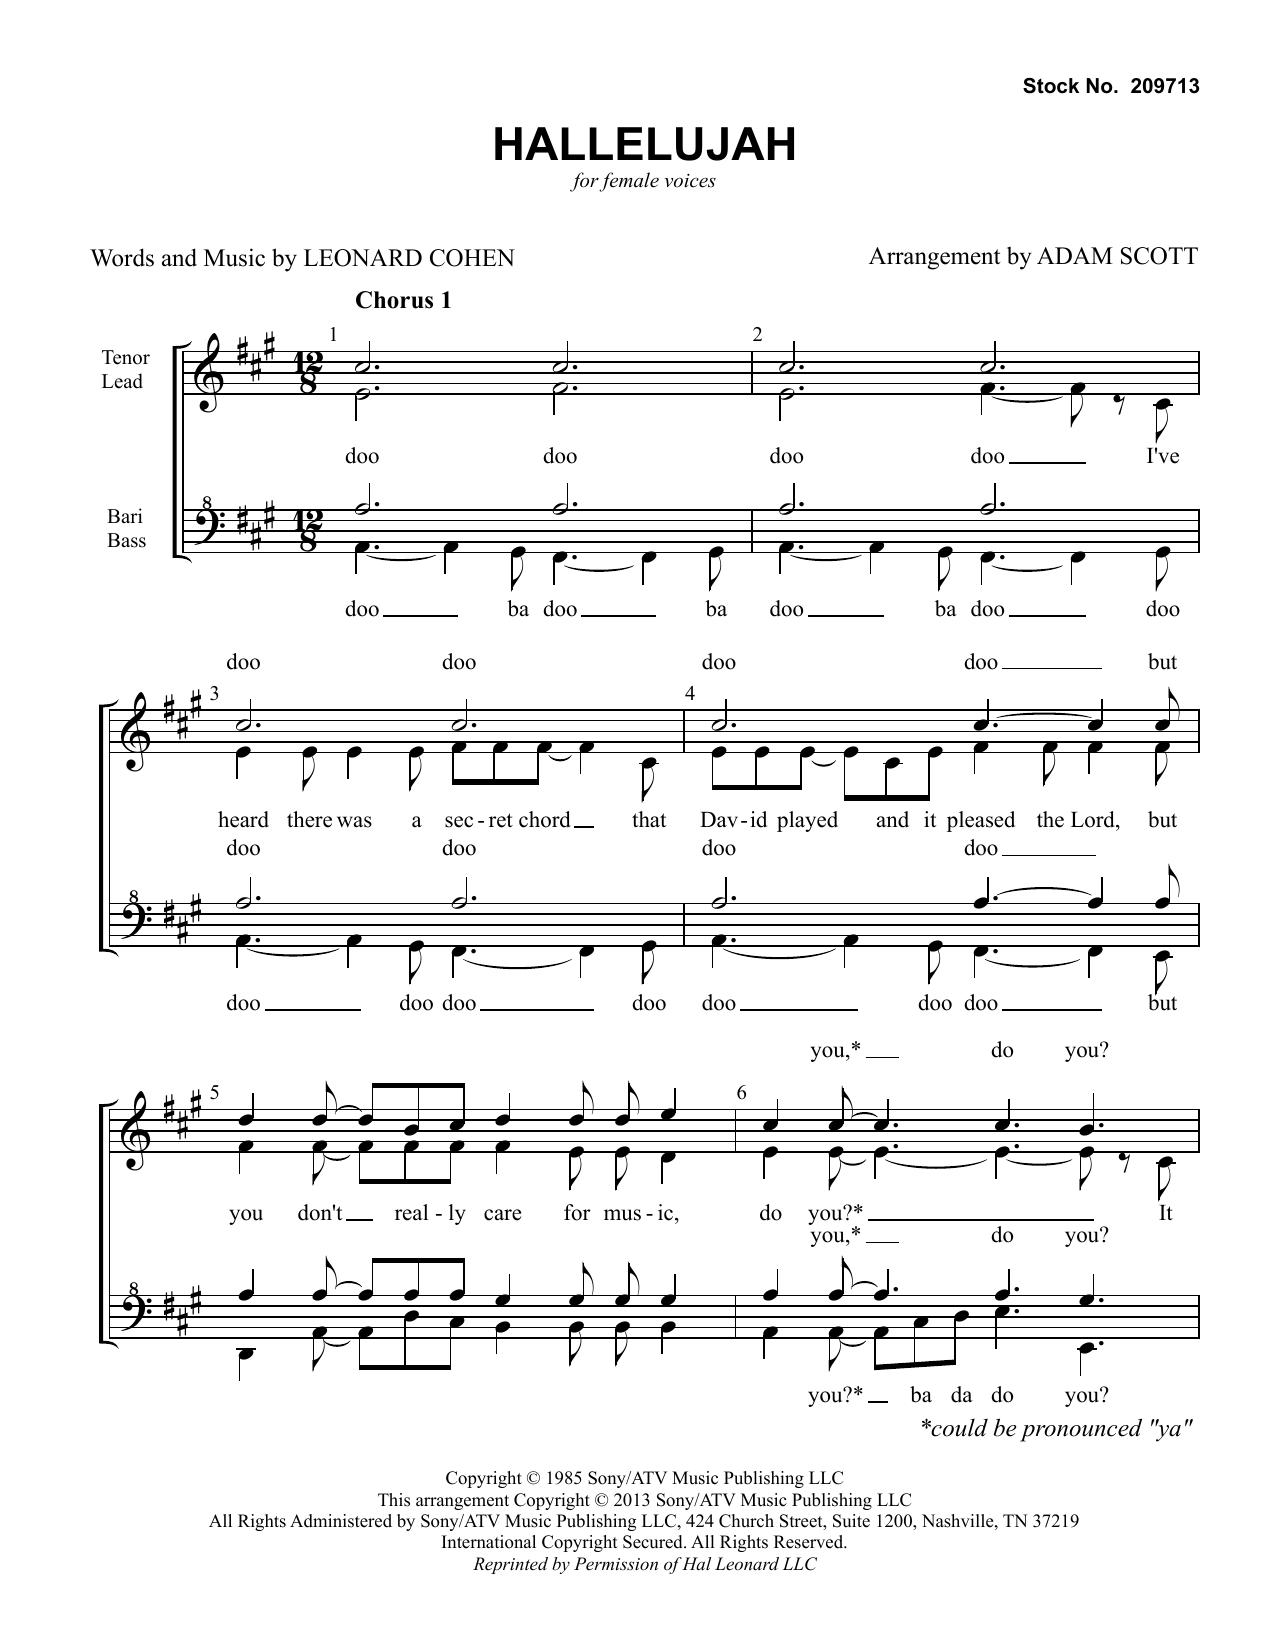 Hallelujah (arr. Adam Scott) Sheet Music